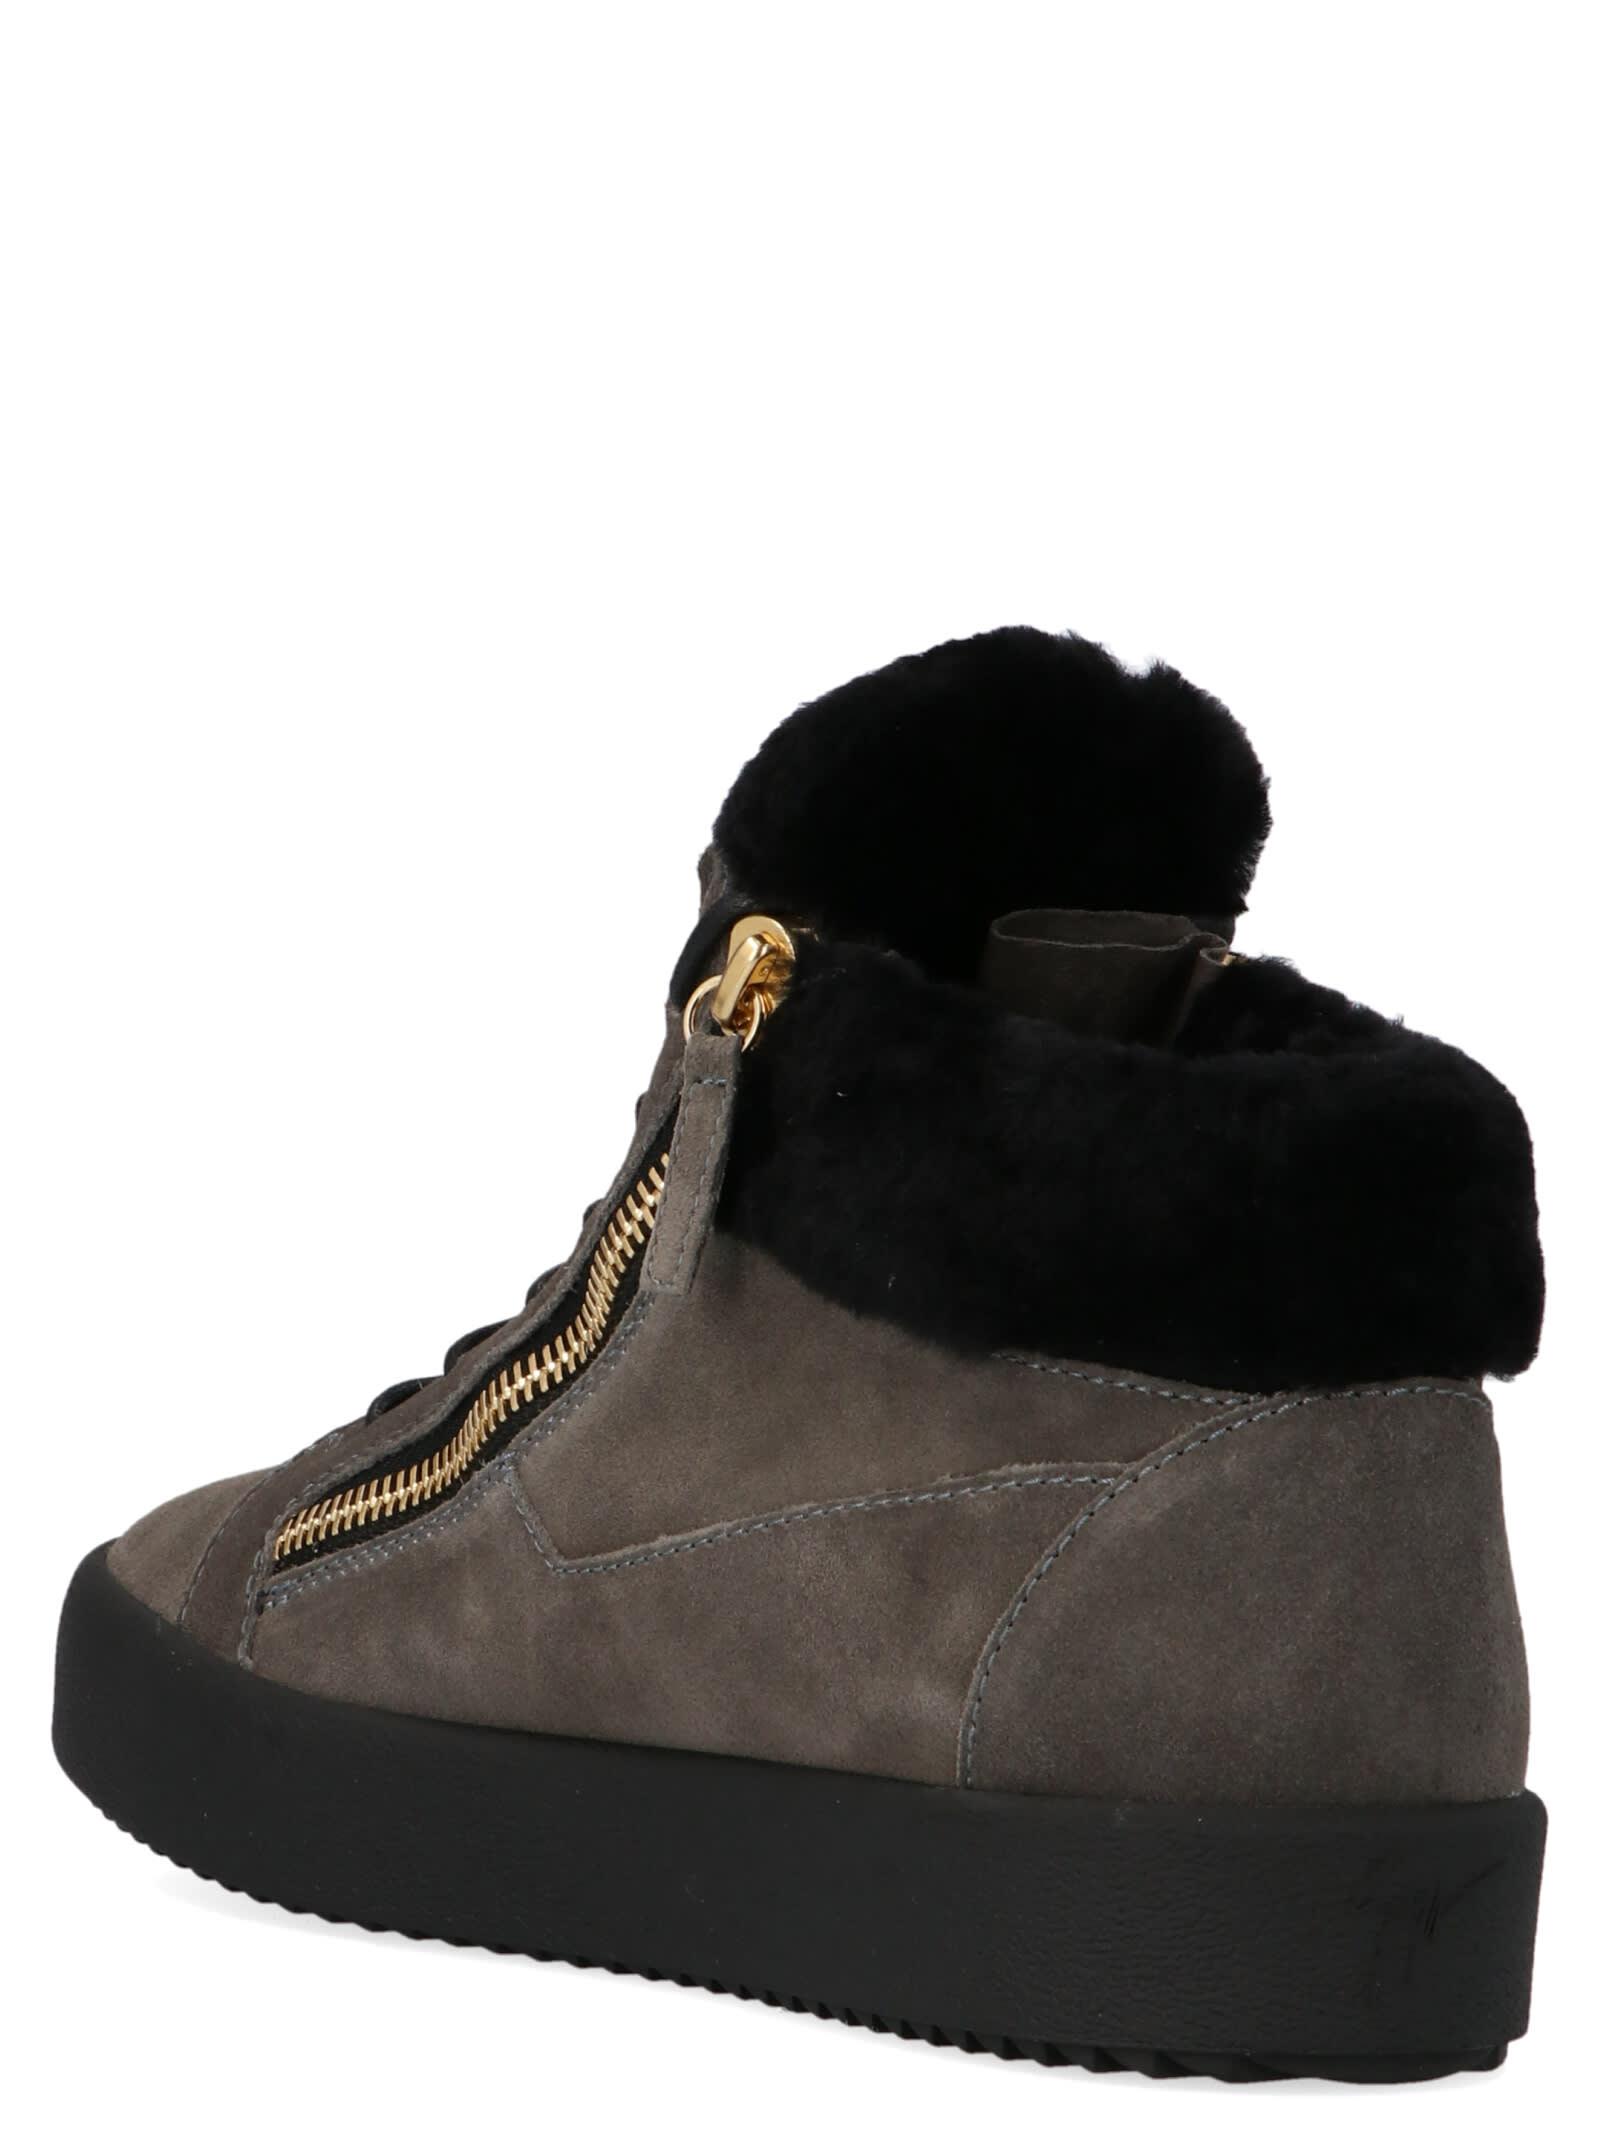 Giuseppe Zanotti Mens May London Shearling Sneaker